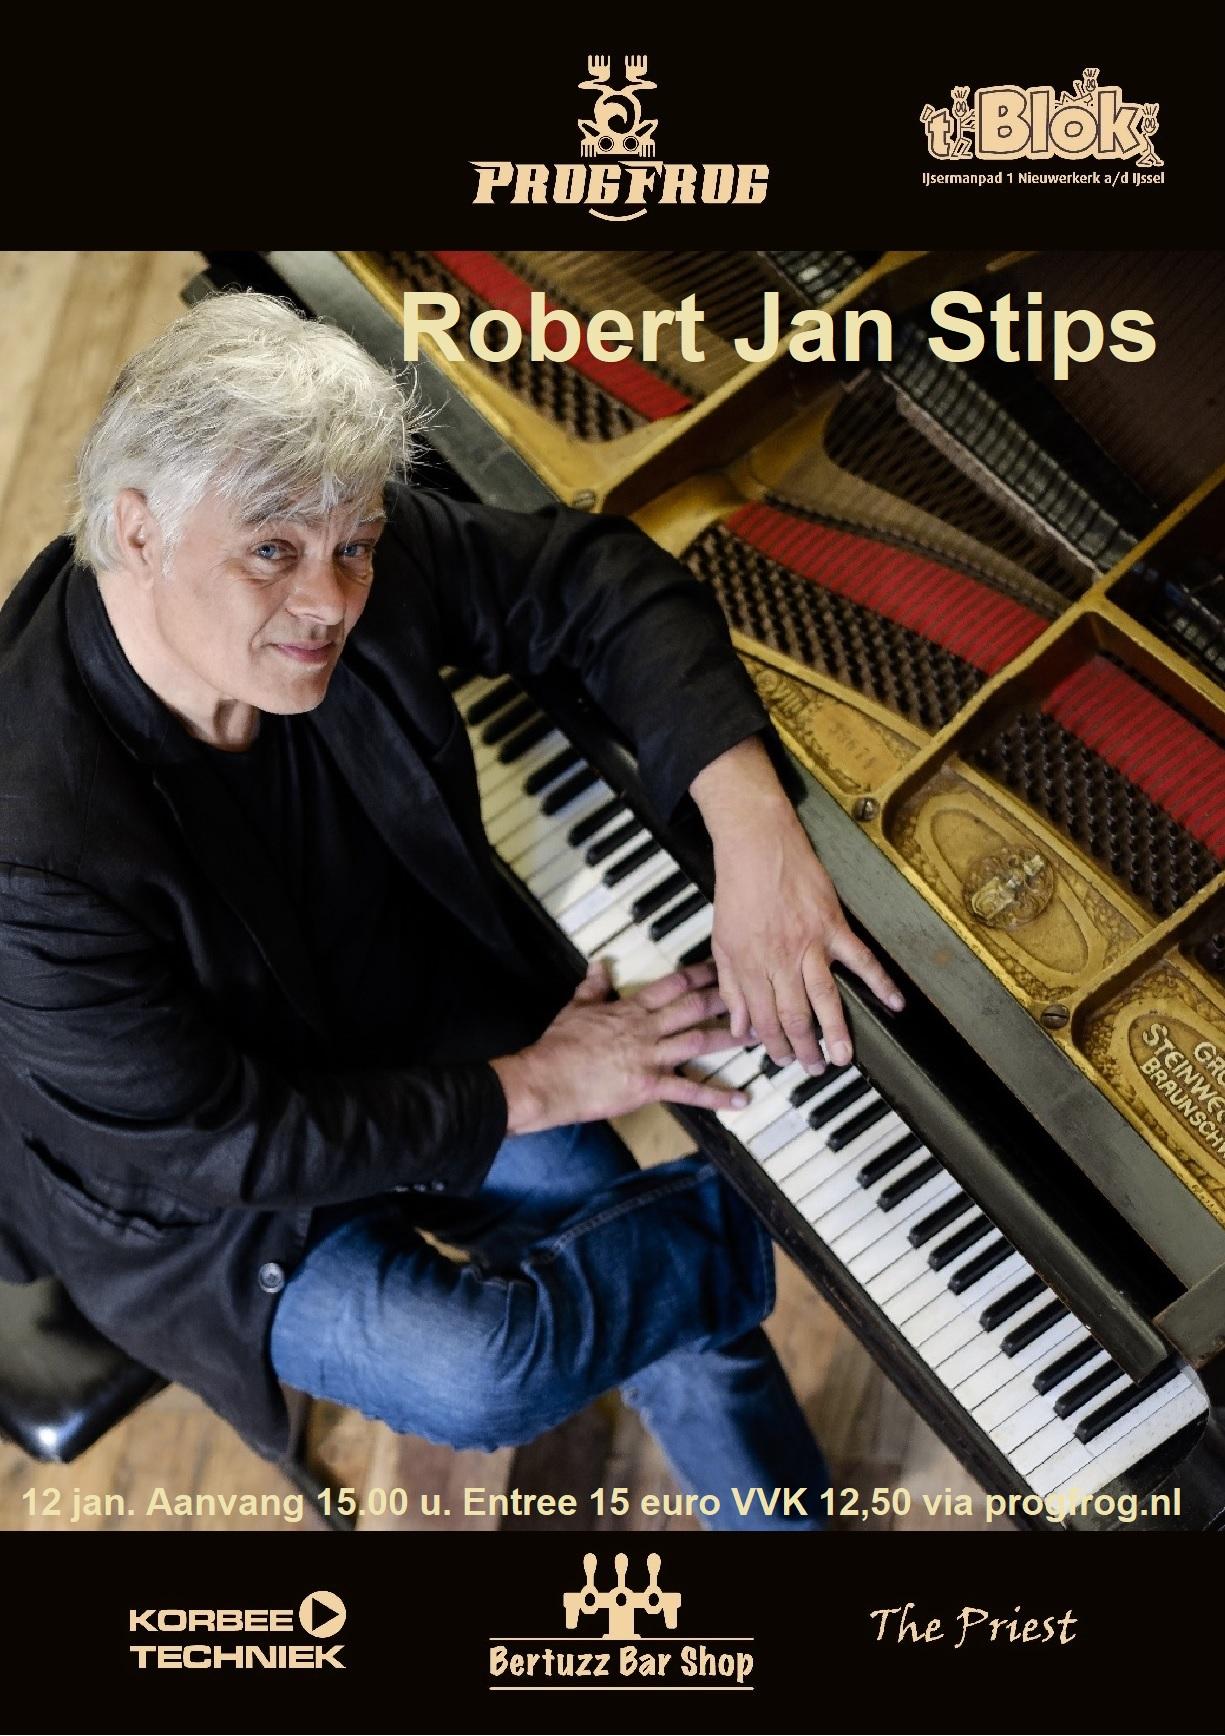 Robert Jan Stips